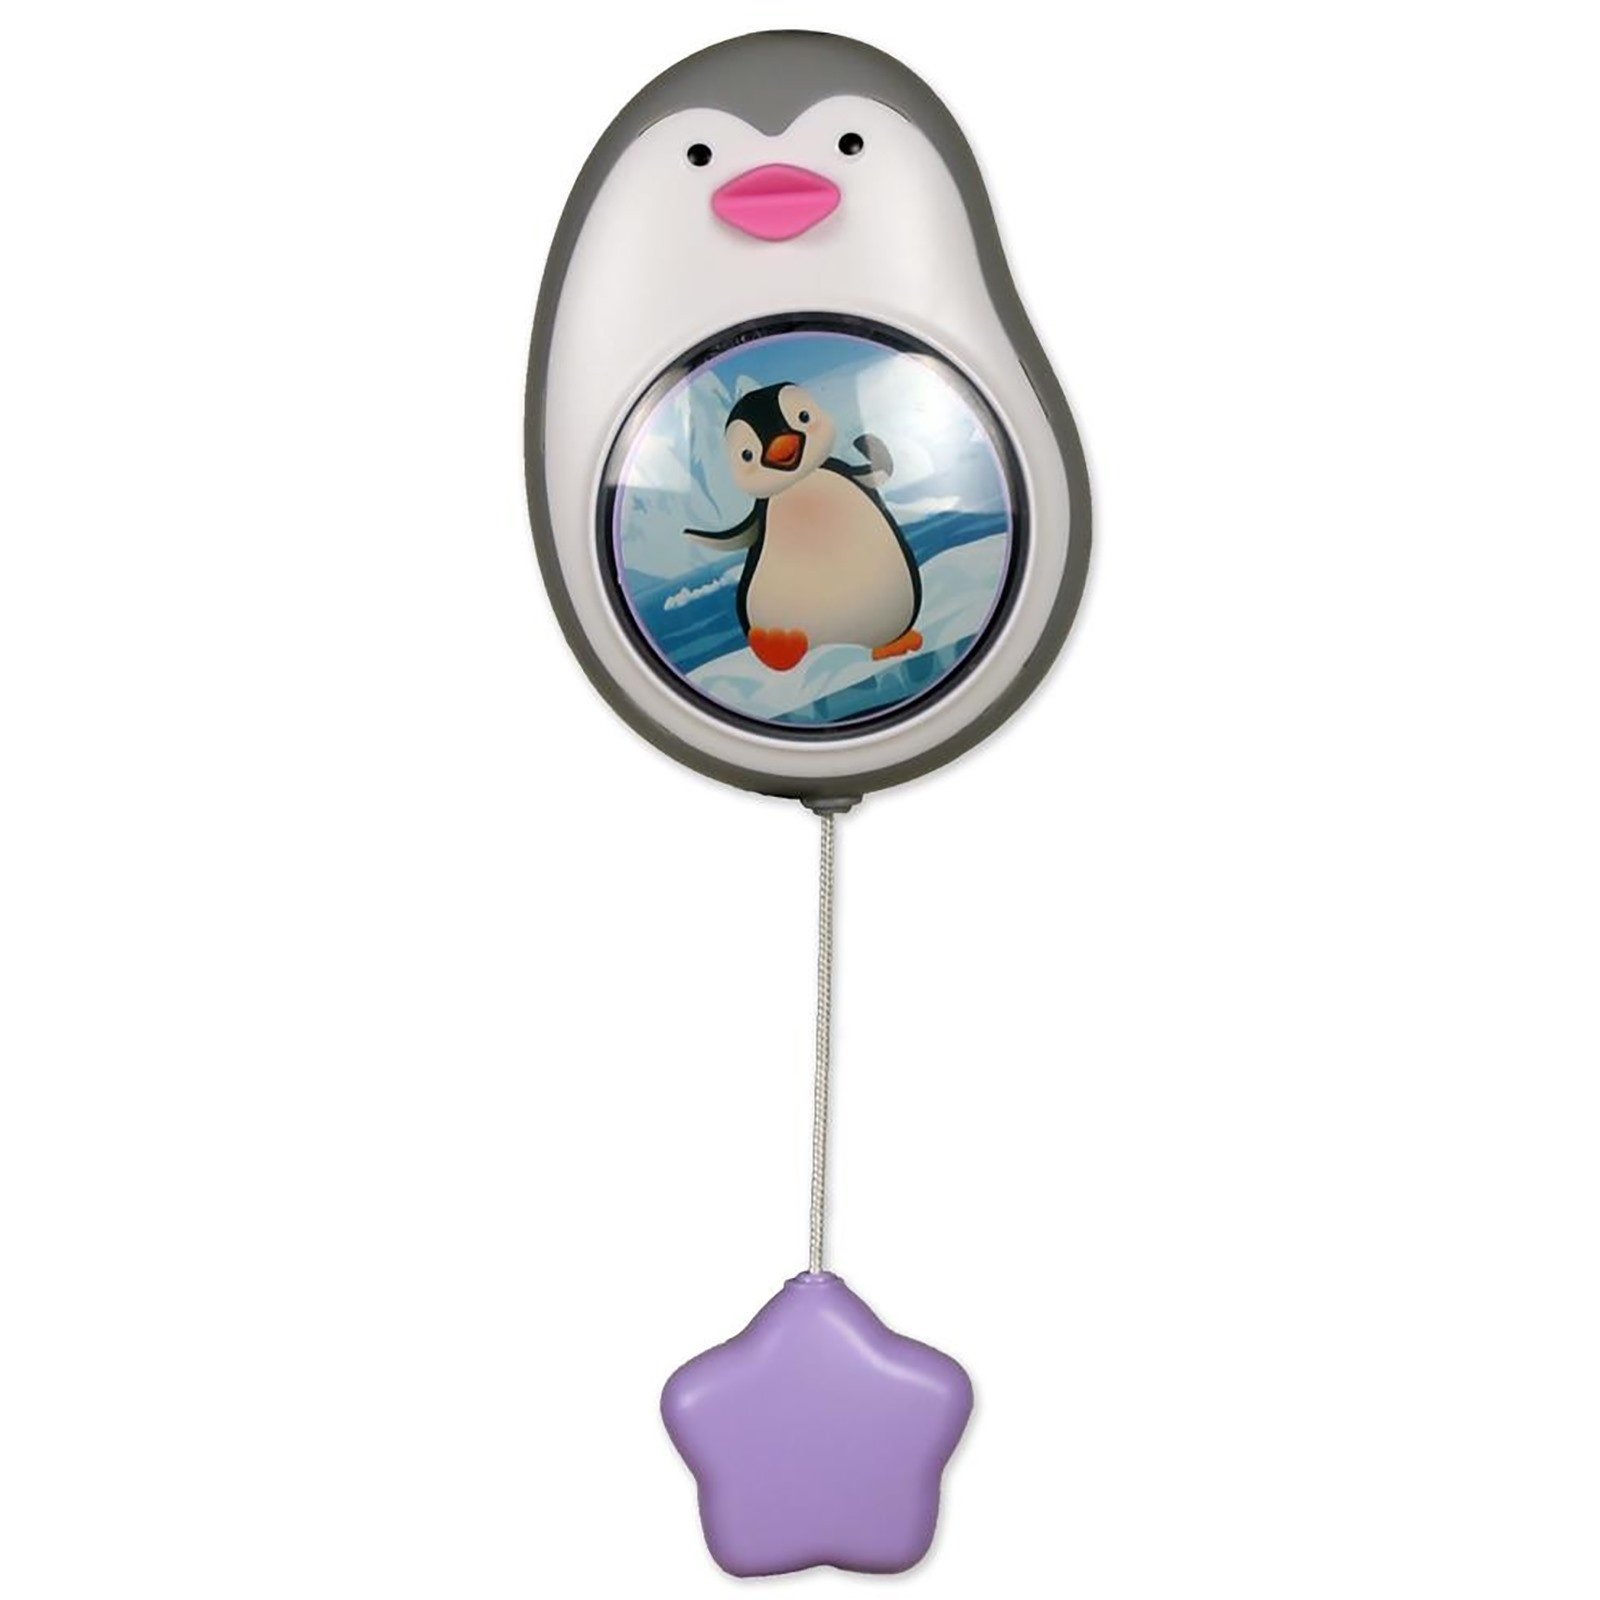 Ebebek Birlik Oyuncak Sweet Dreams My Sleeping Friend Penguin